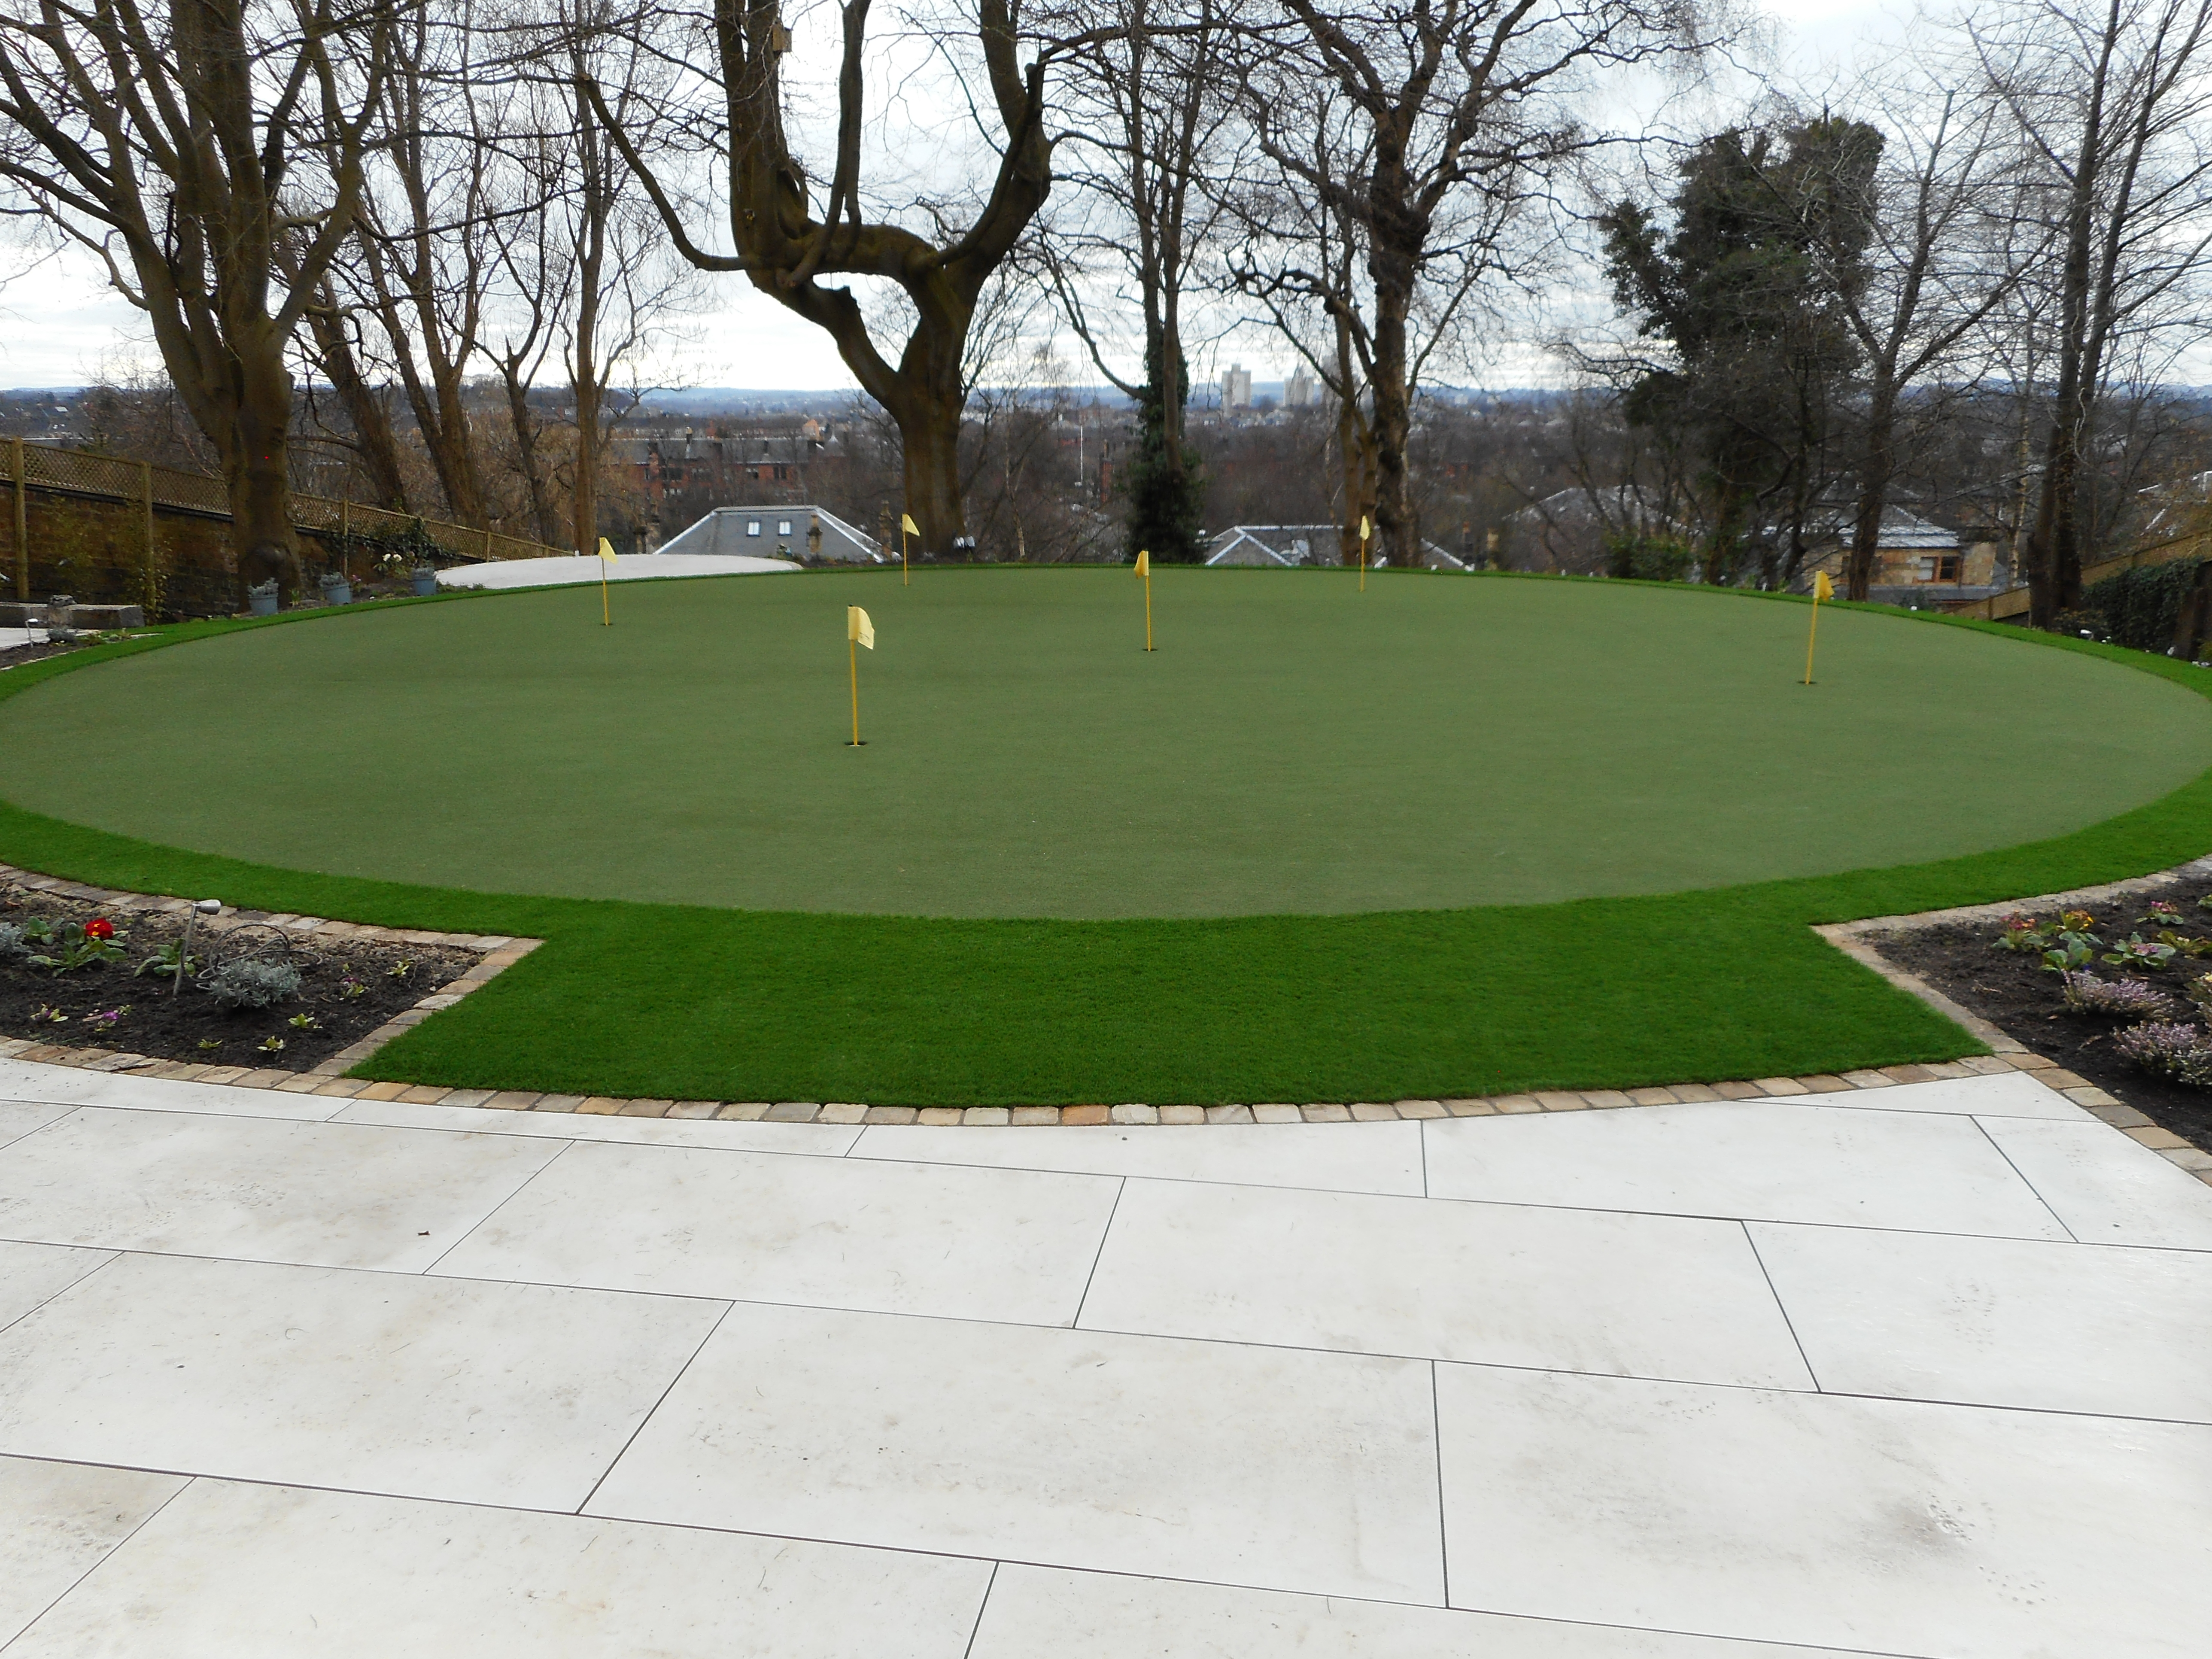 Private Putting Green Installation in Scotland